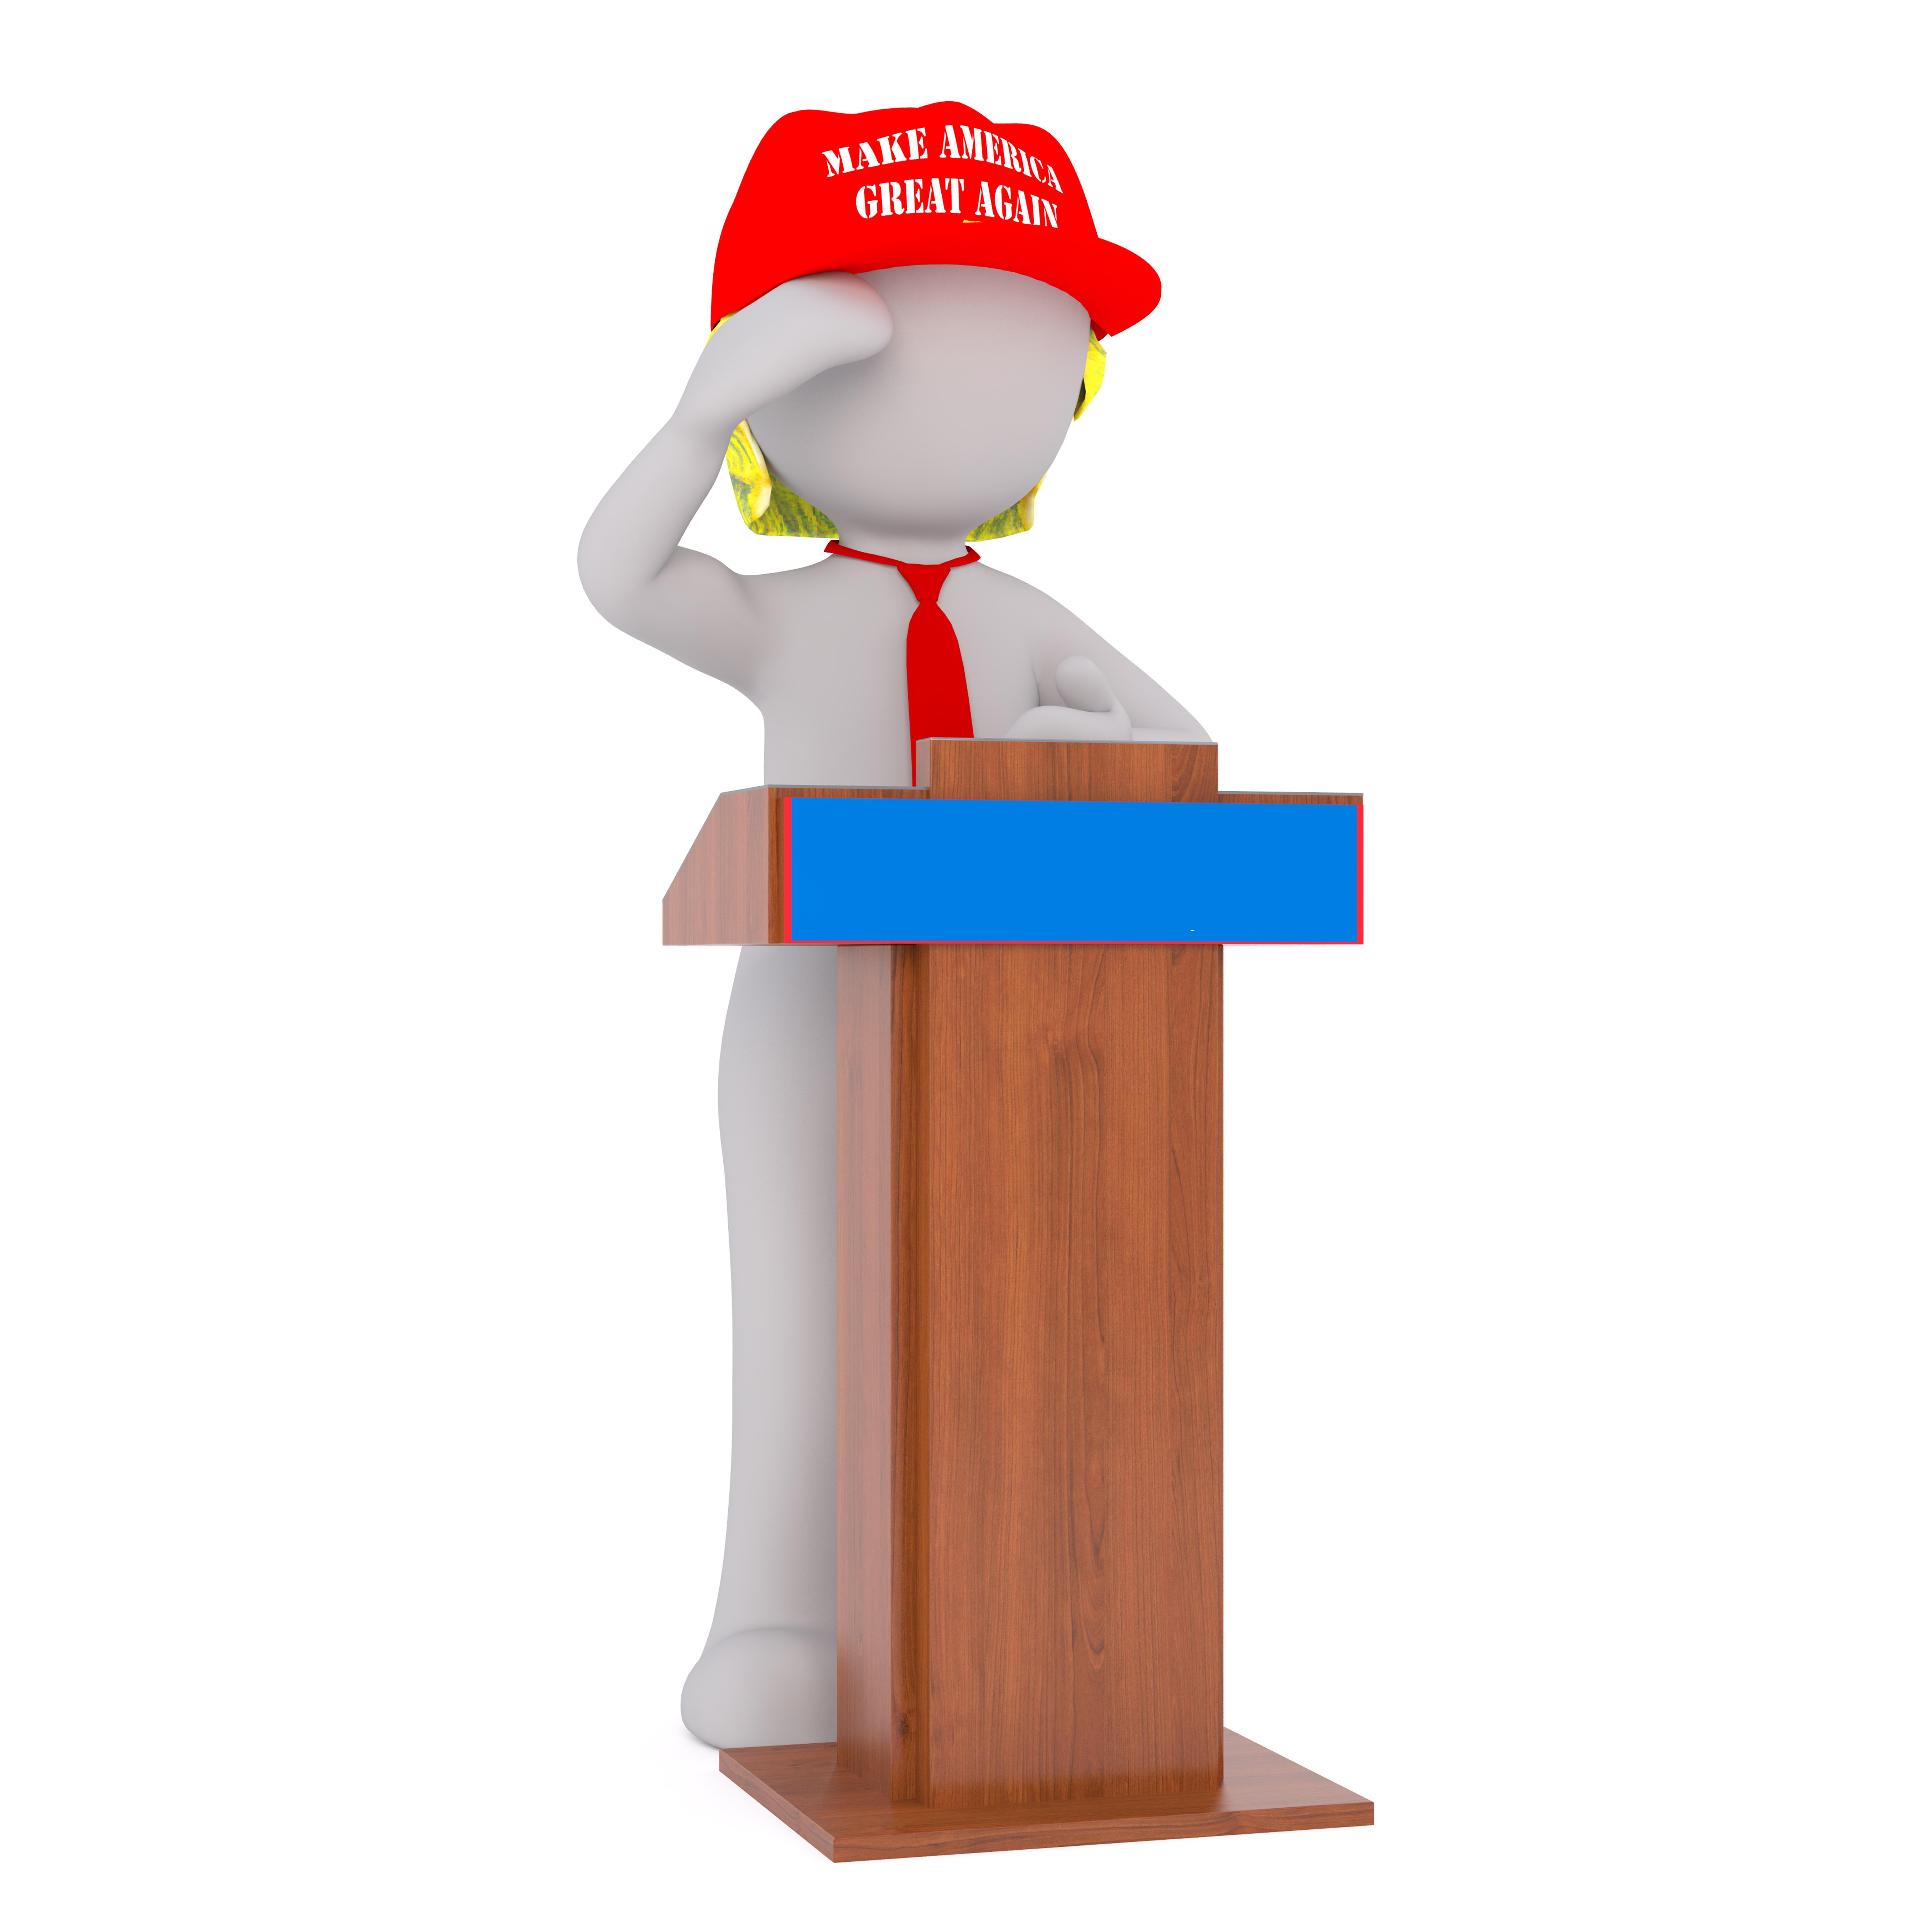 Gambar Terpencil Model Amerika Serikat Presiden Arca Truf